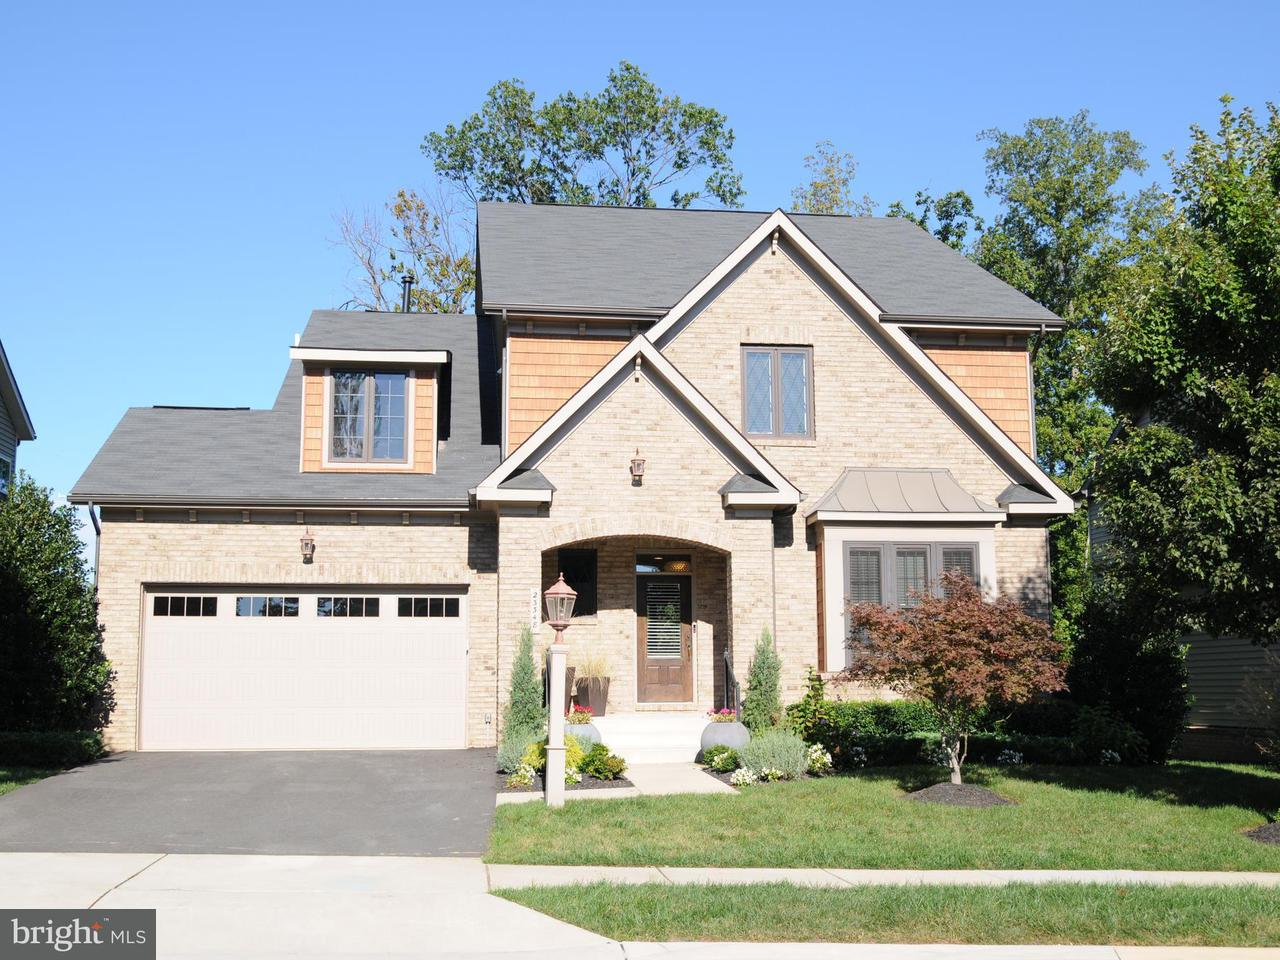 Single Family Home for Sale at 23348 MORNING WALK Drive 23348 MORNING WALK Drive Ashburn, Virginia 20148 United States